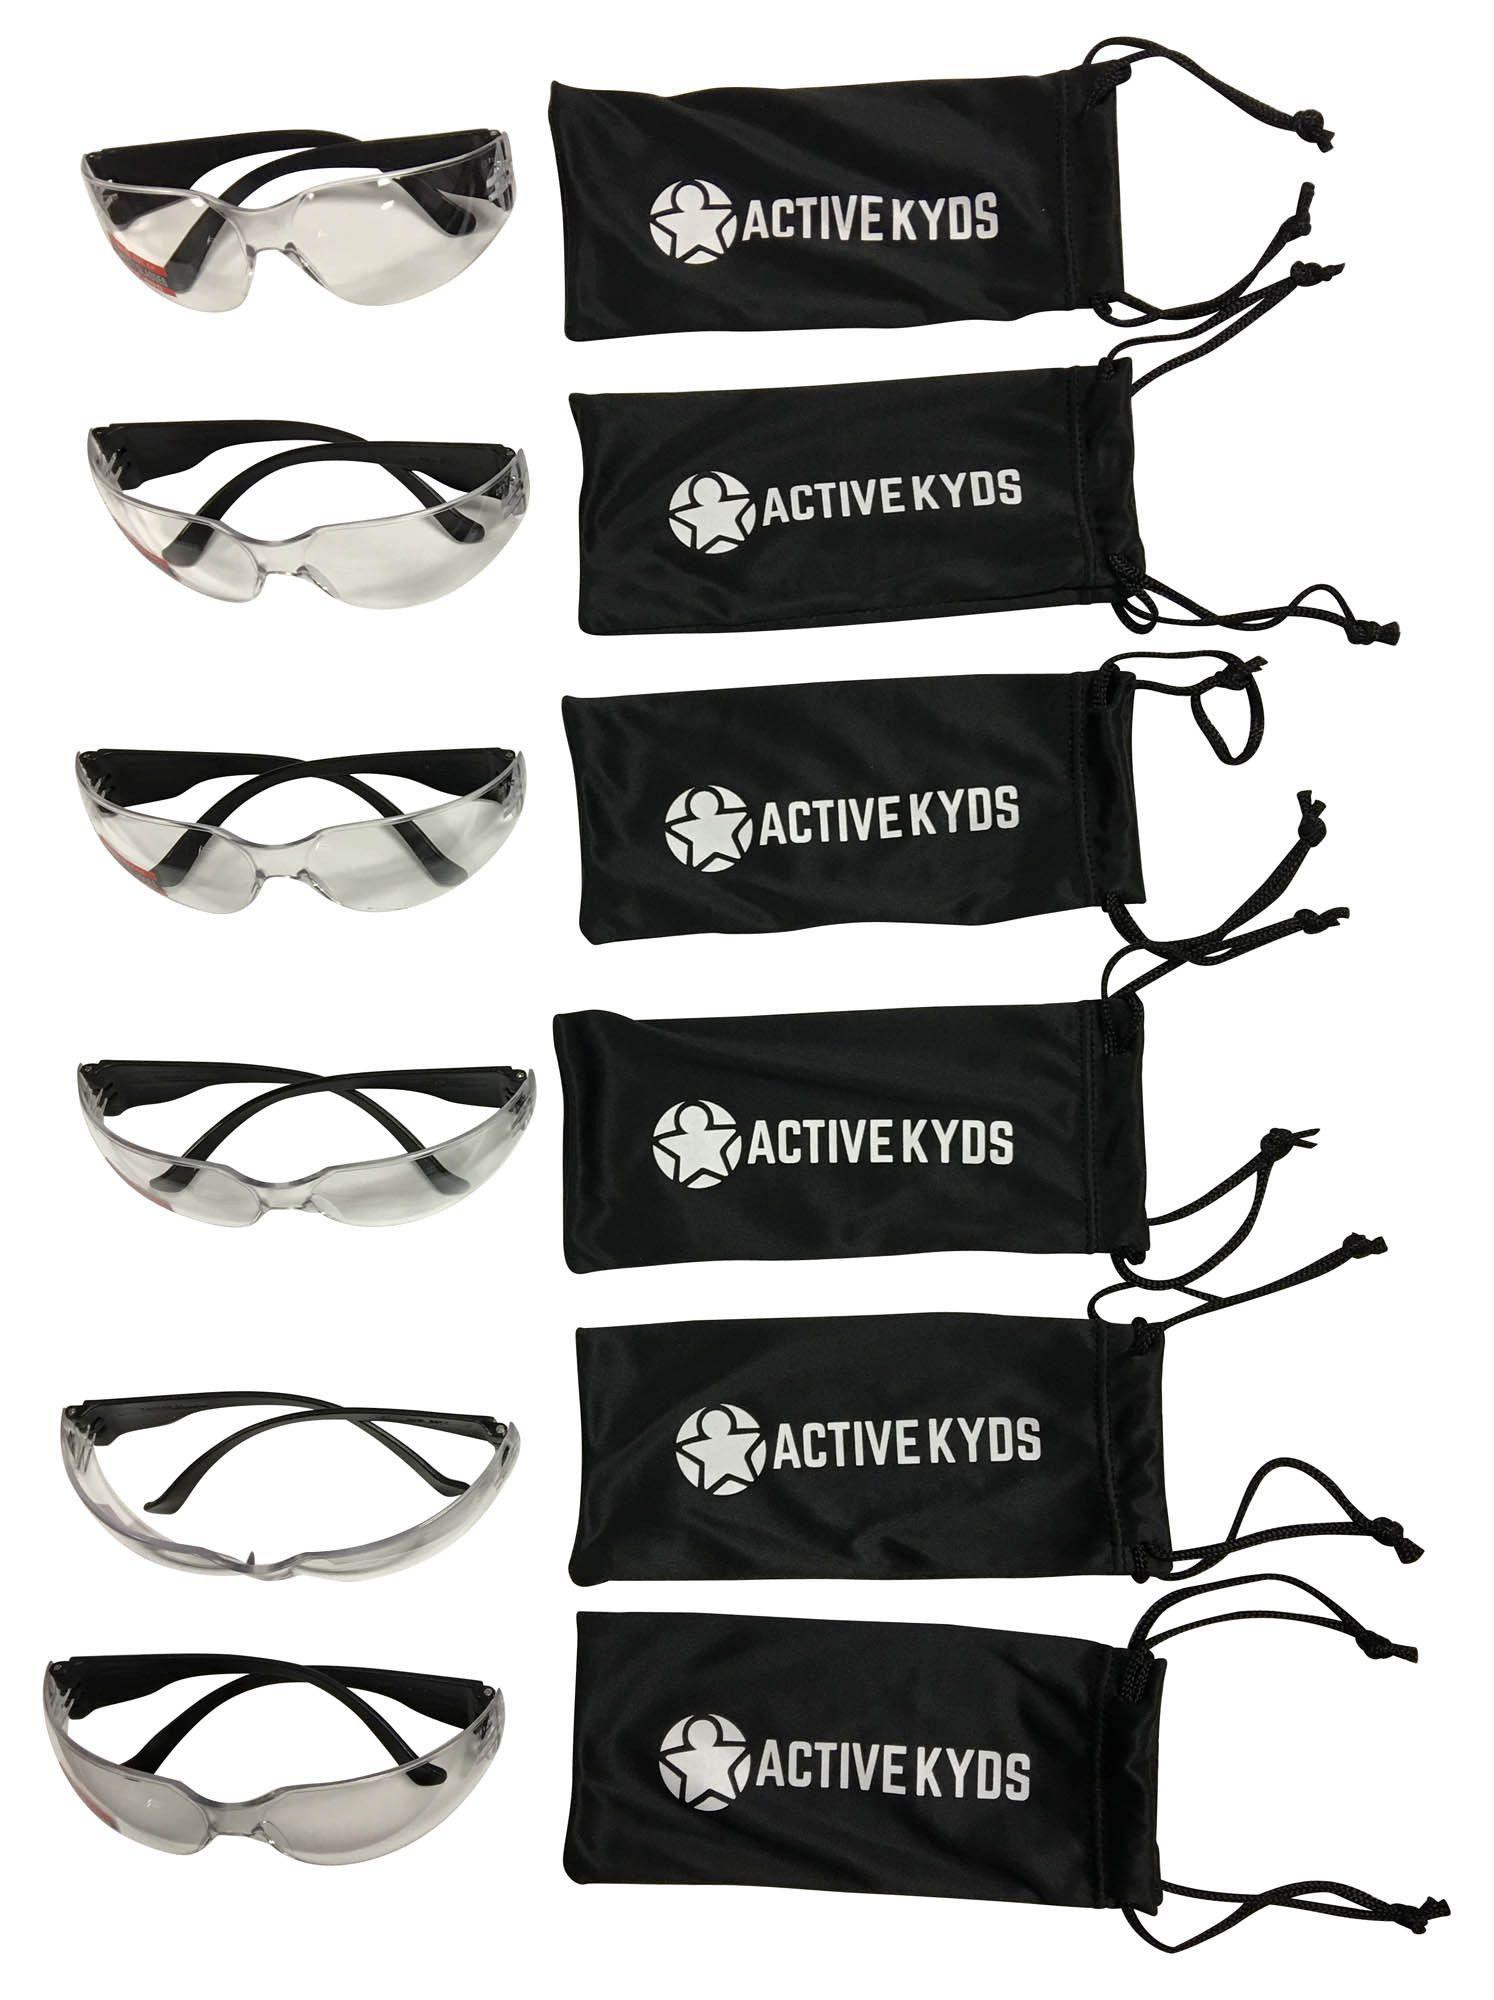 6 pack kids safety glasses with black stem